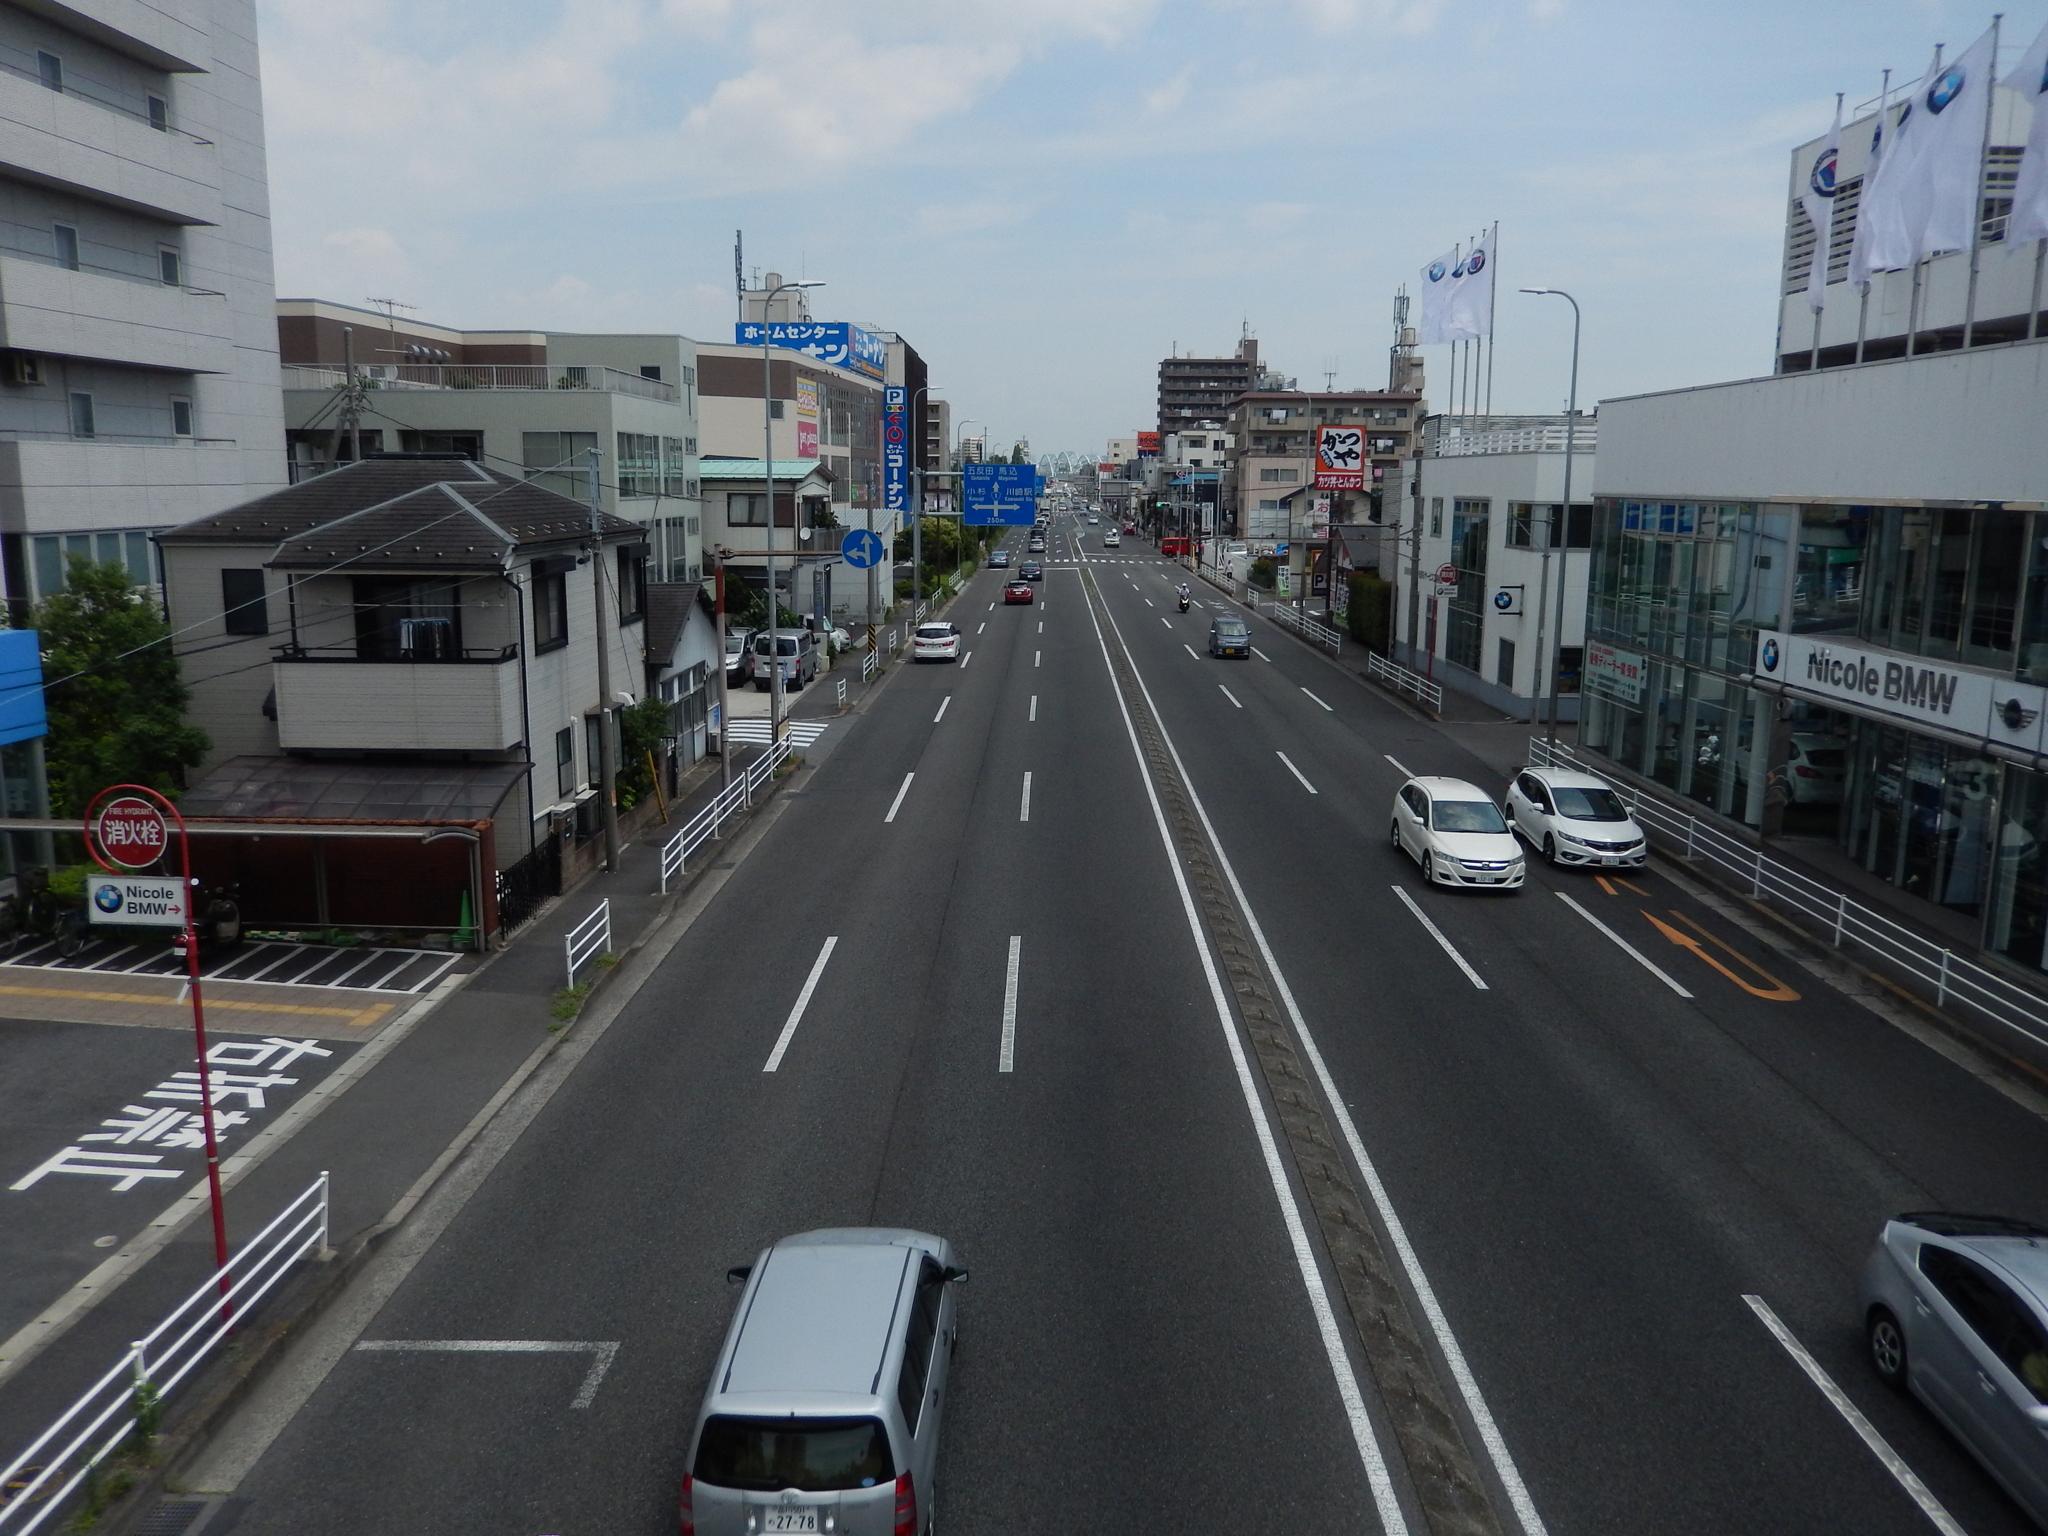 f:id:ToshUeno:20160710102750j:plain